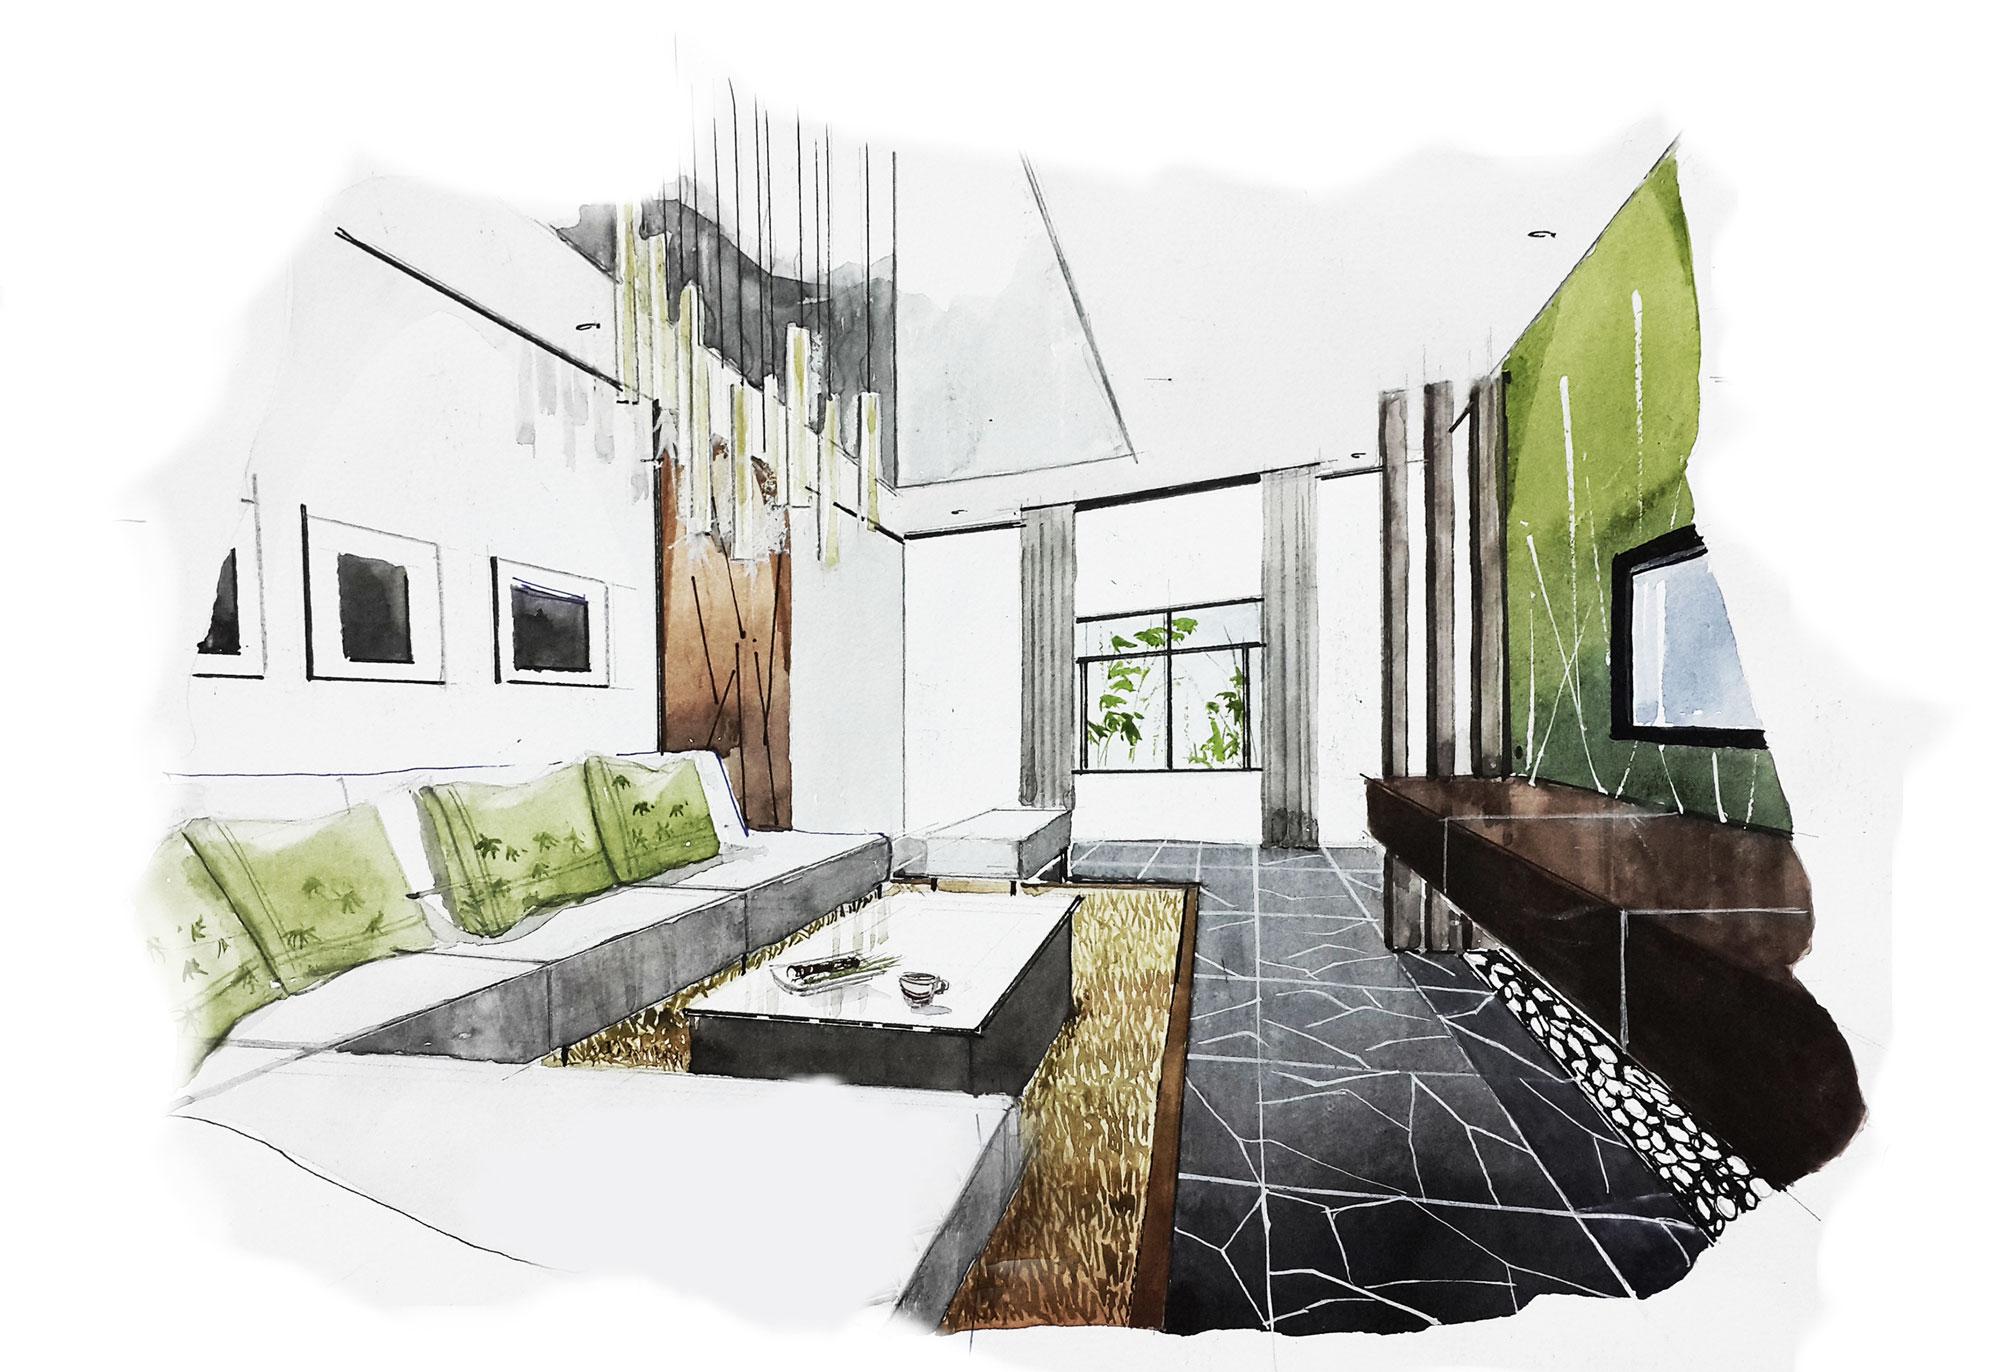 conceptview_interior_general_1.jpg